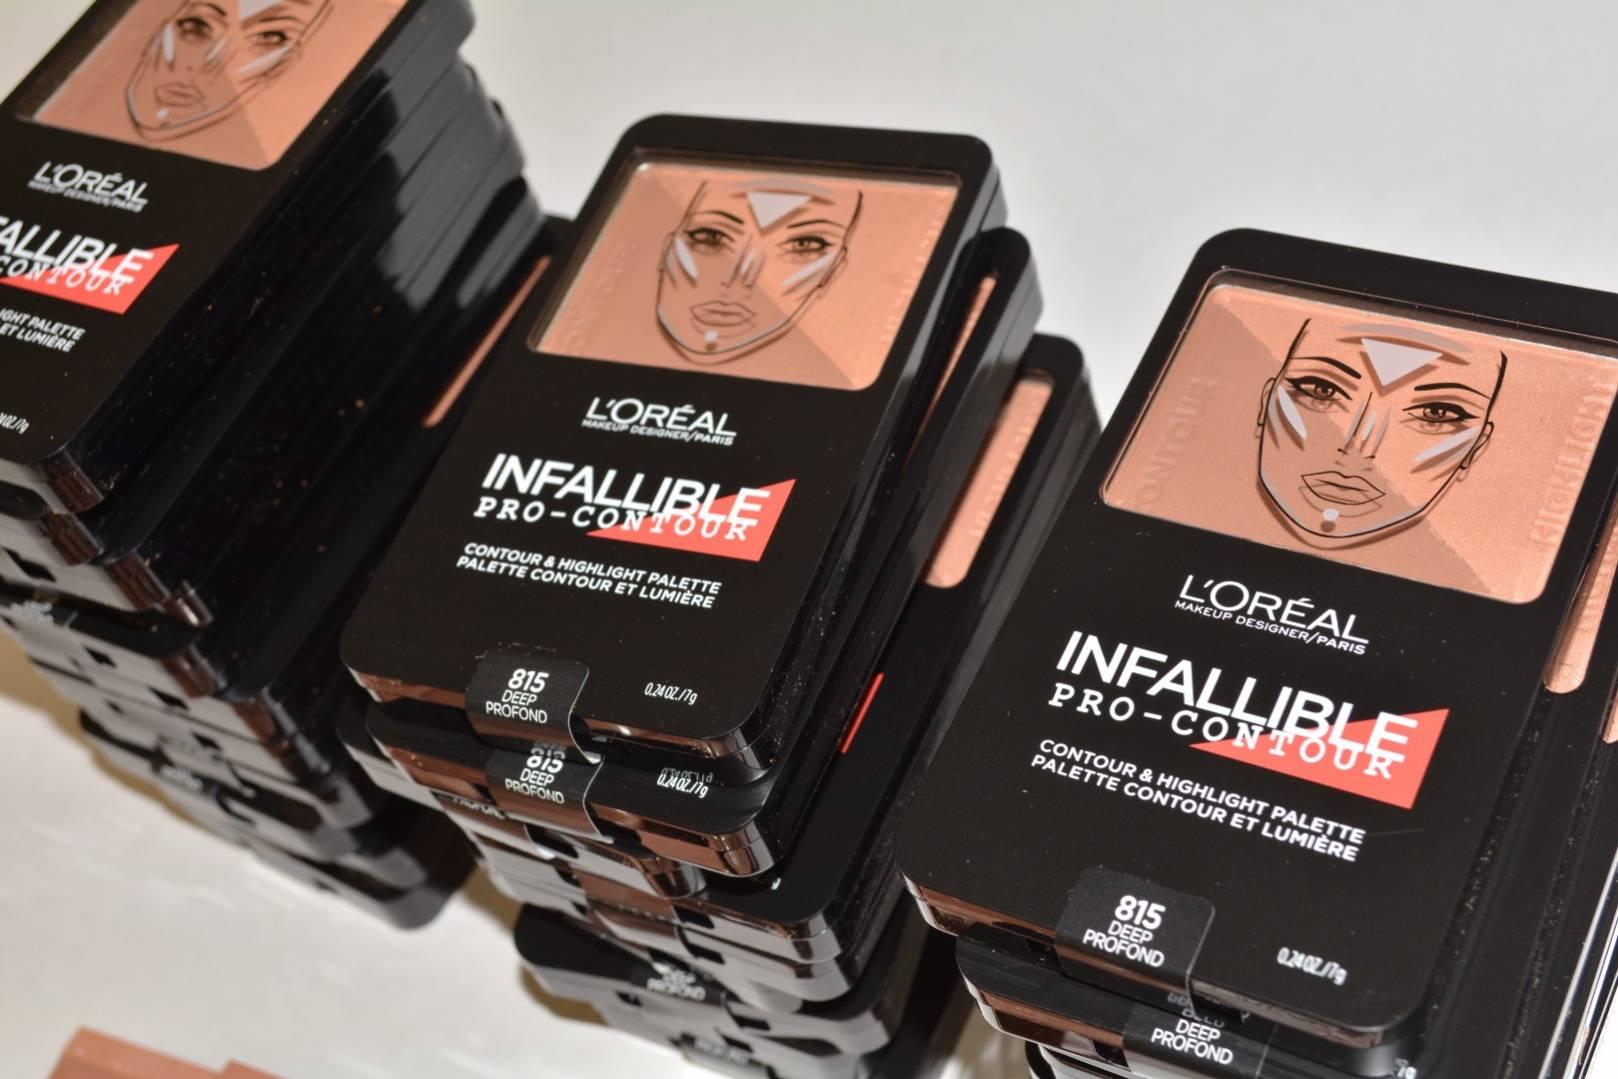 Via Trading   Wholesale L'Oreal Cosmetic Lots   Wholesale L'Oreal Makeup